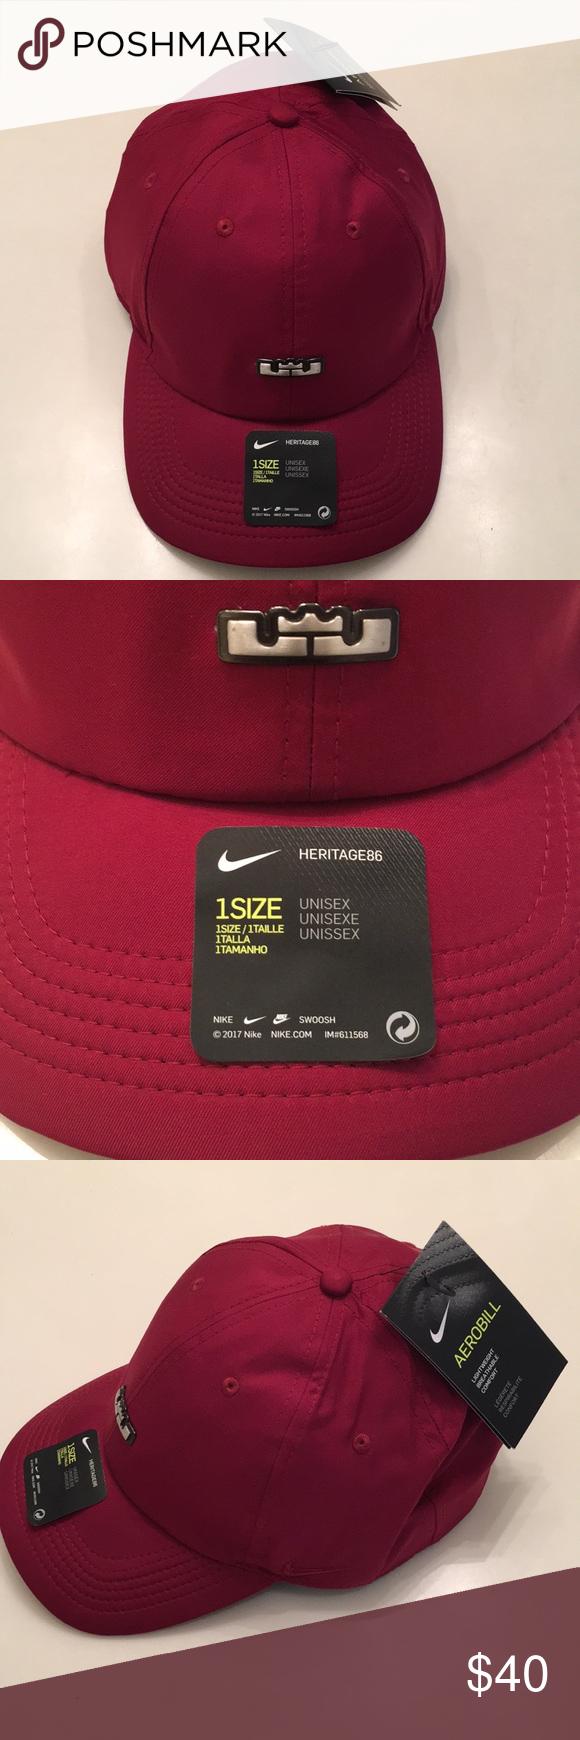 Nike Men s Lebron Cap The Nike Lebron Heritage 86 QS Adjustable Hat  features signature details on 8791fac539e